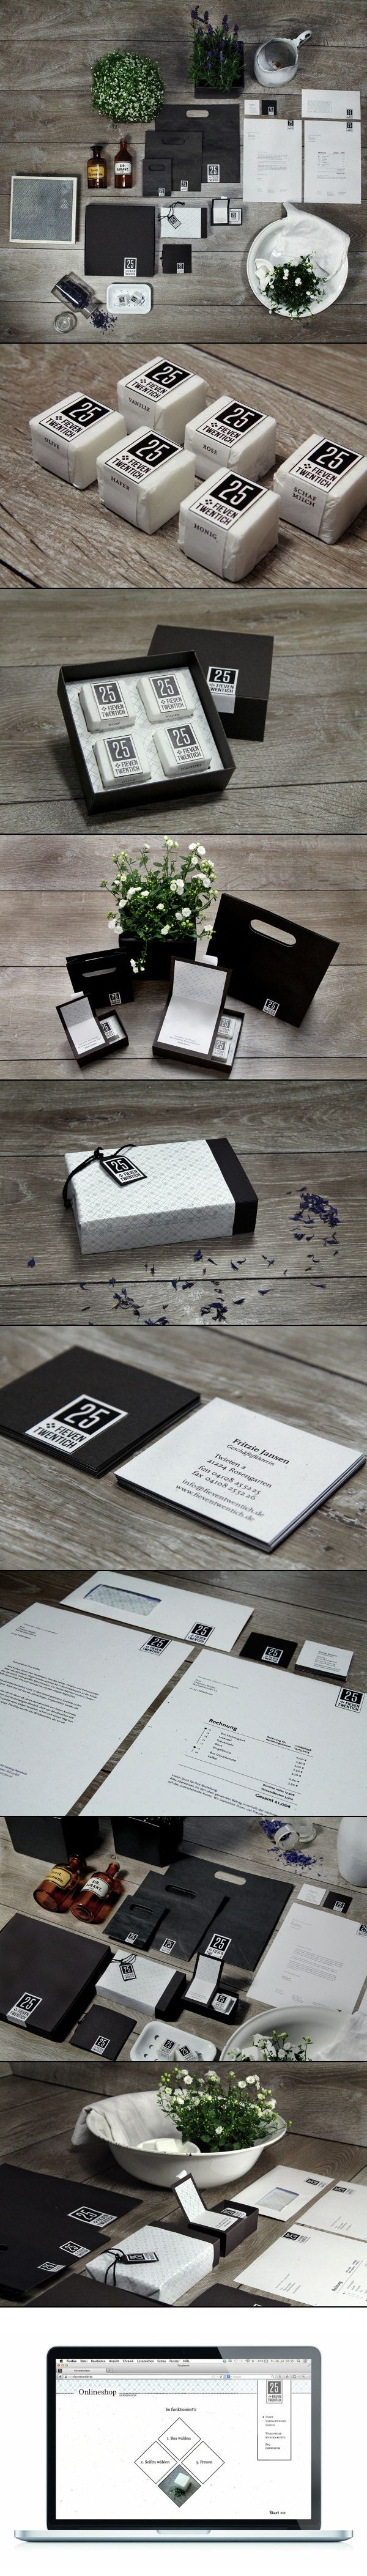 Unique Branding Design, Fieven Twentich #Branding #Design (http://www.pinterest.com/aldenchong/)